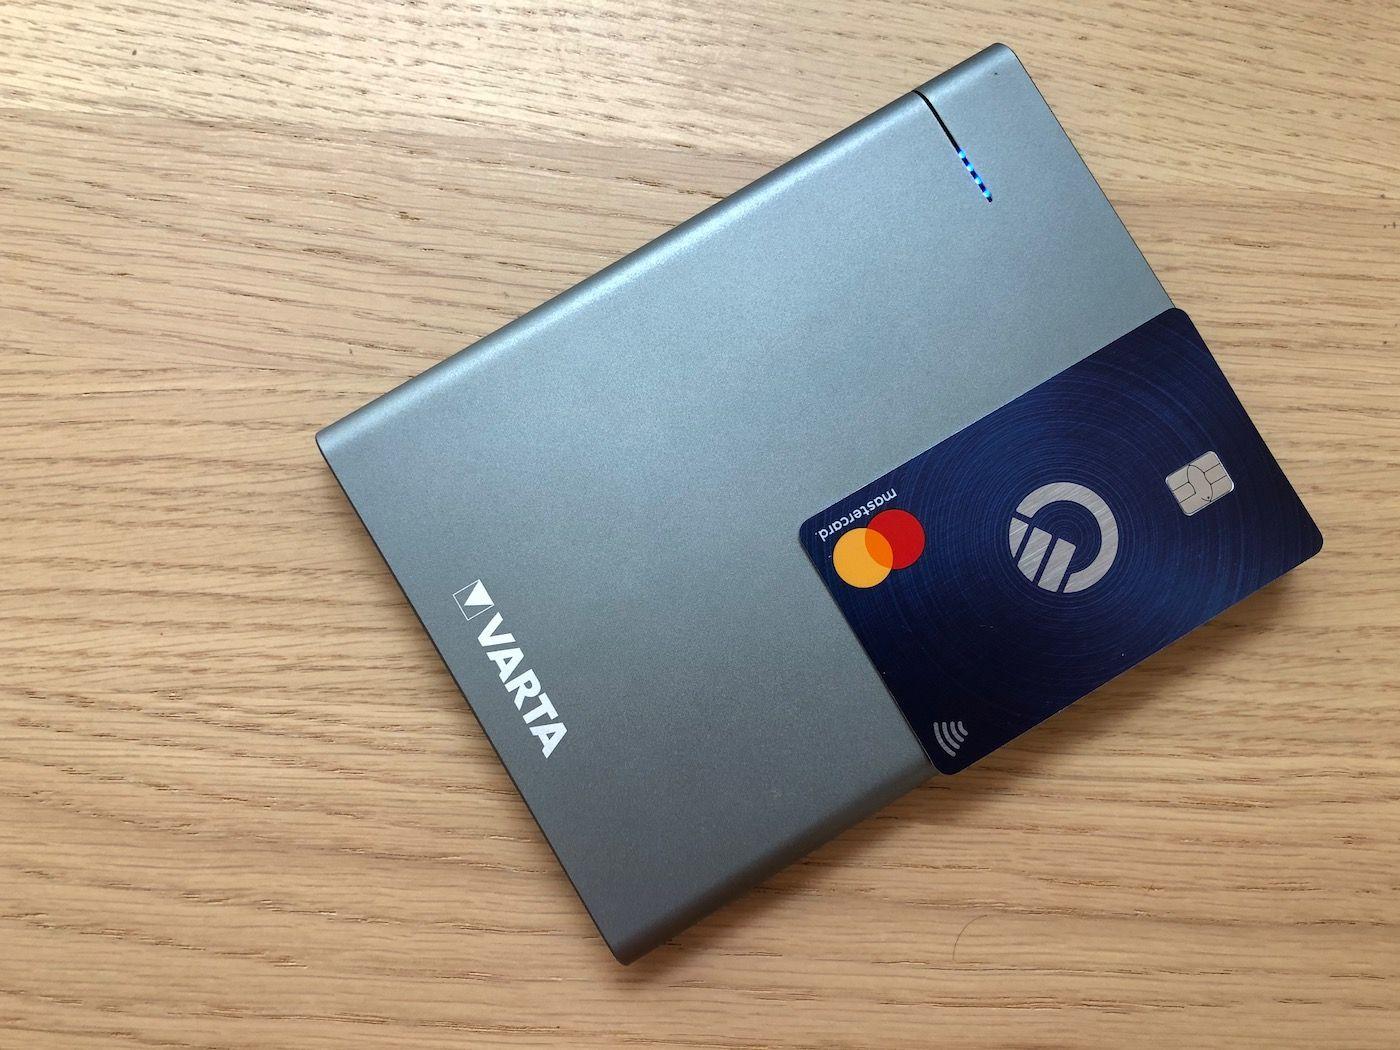 Varta PowerBank Slim 12000mAh size